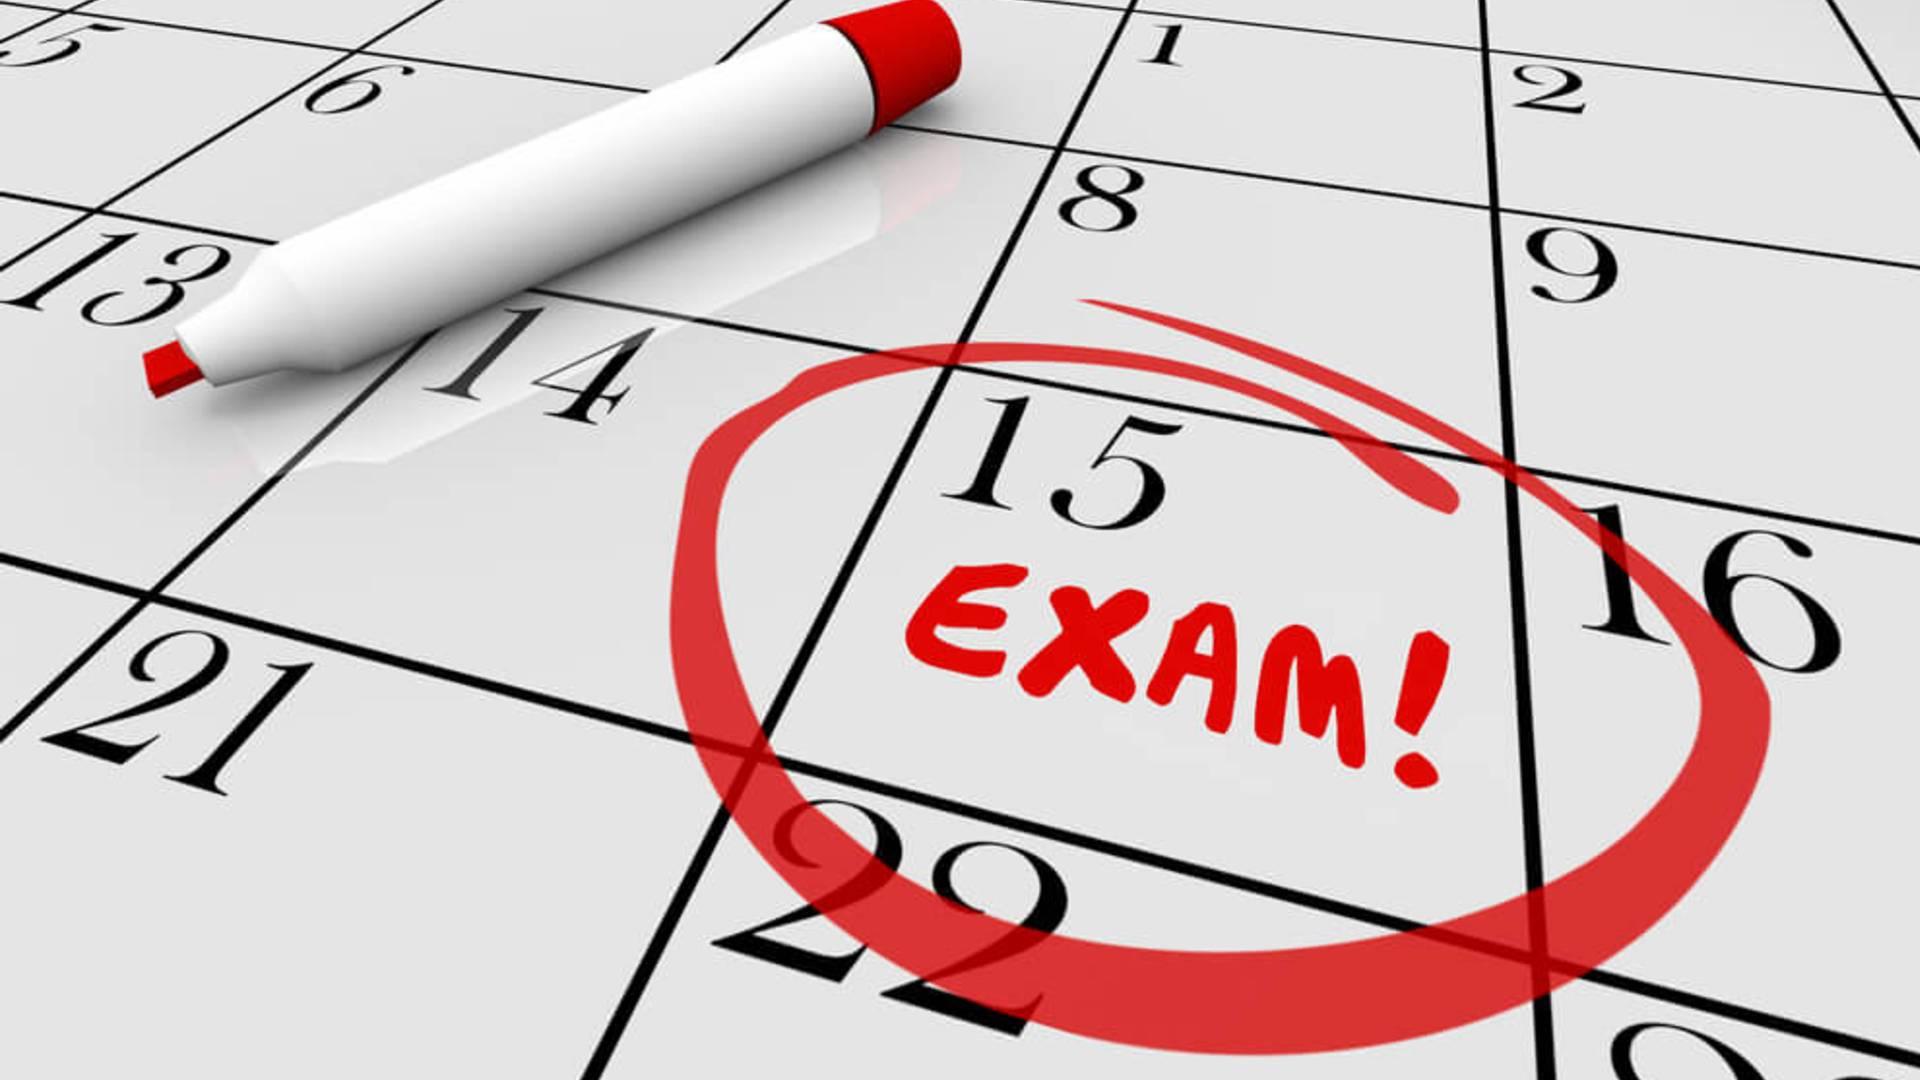 CBSE NEET JEE NET Exam dates